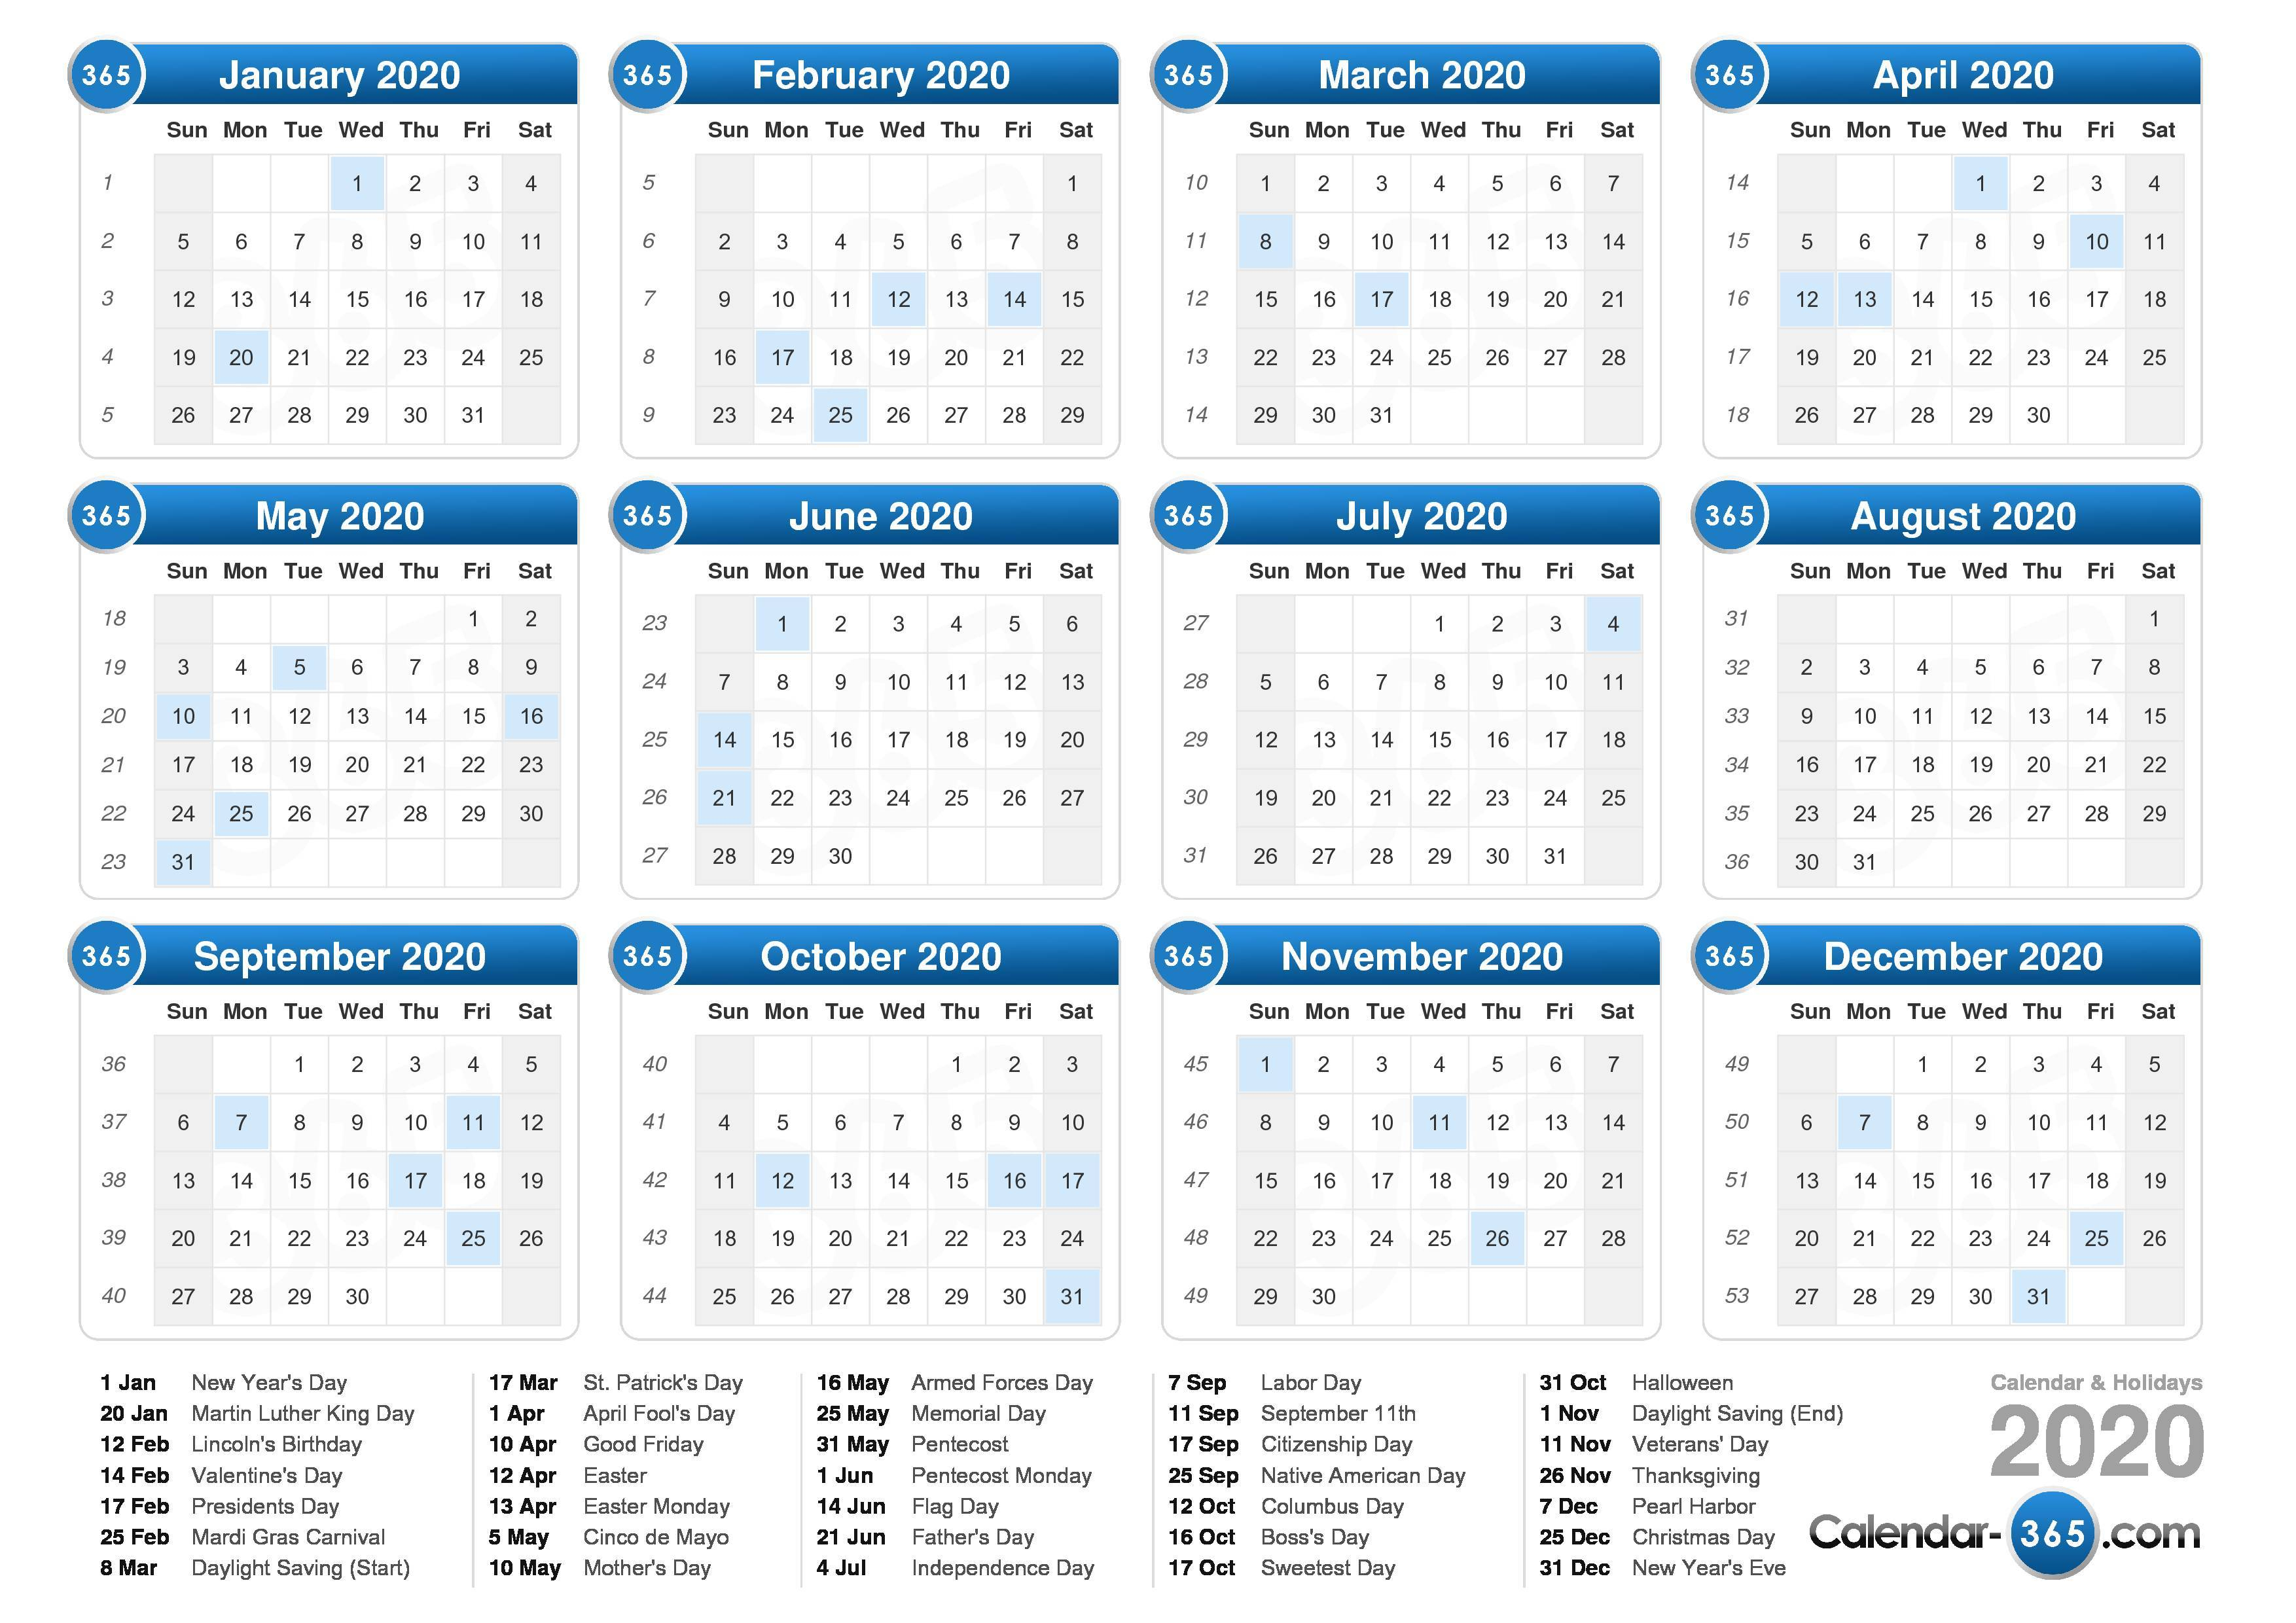 2020 Calendar Showing Holidays